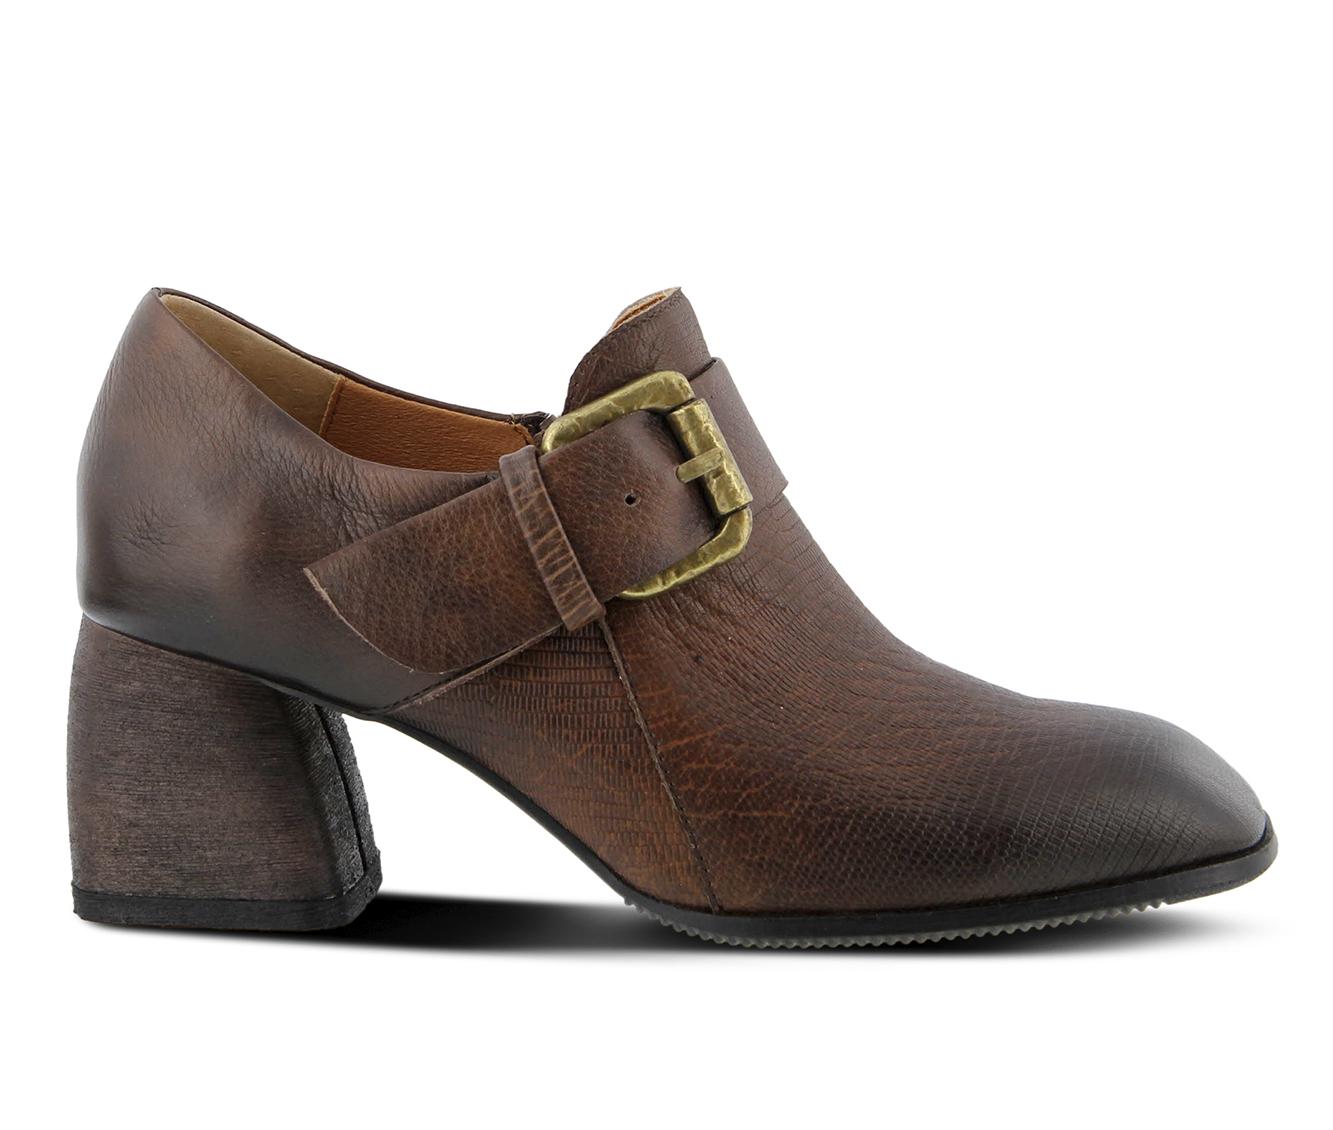 L'Artiste Mercedez Women's Dress Shoe (Brown Leather)